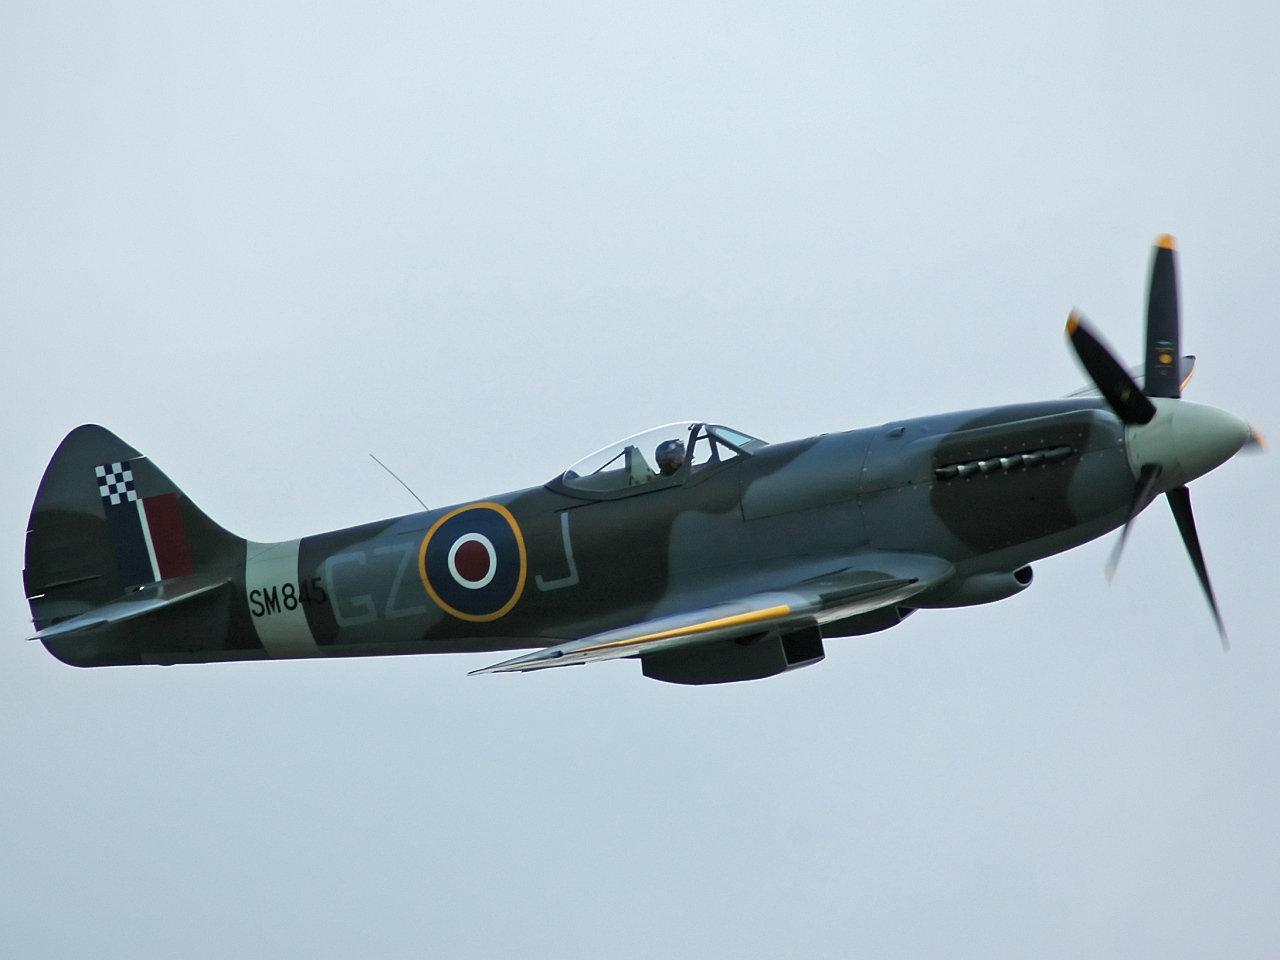 Spitfire_F_XVIII_SM845